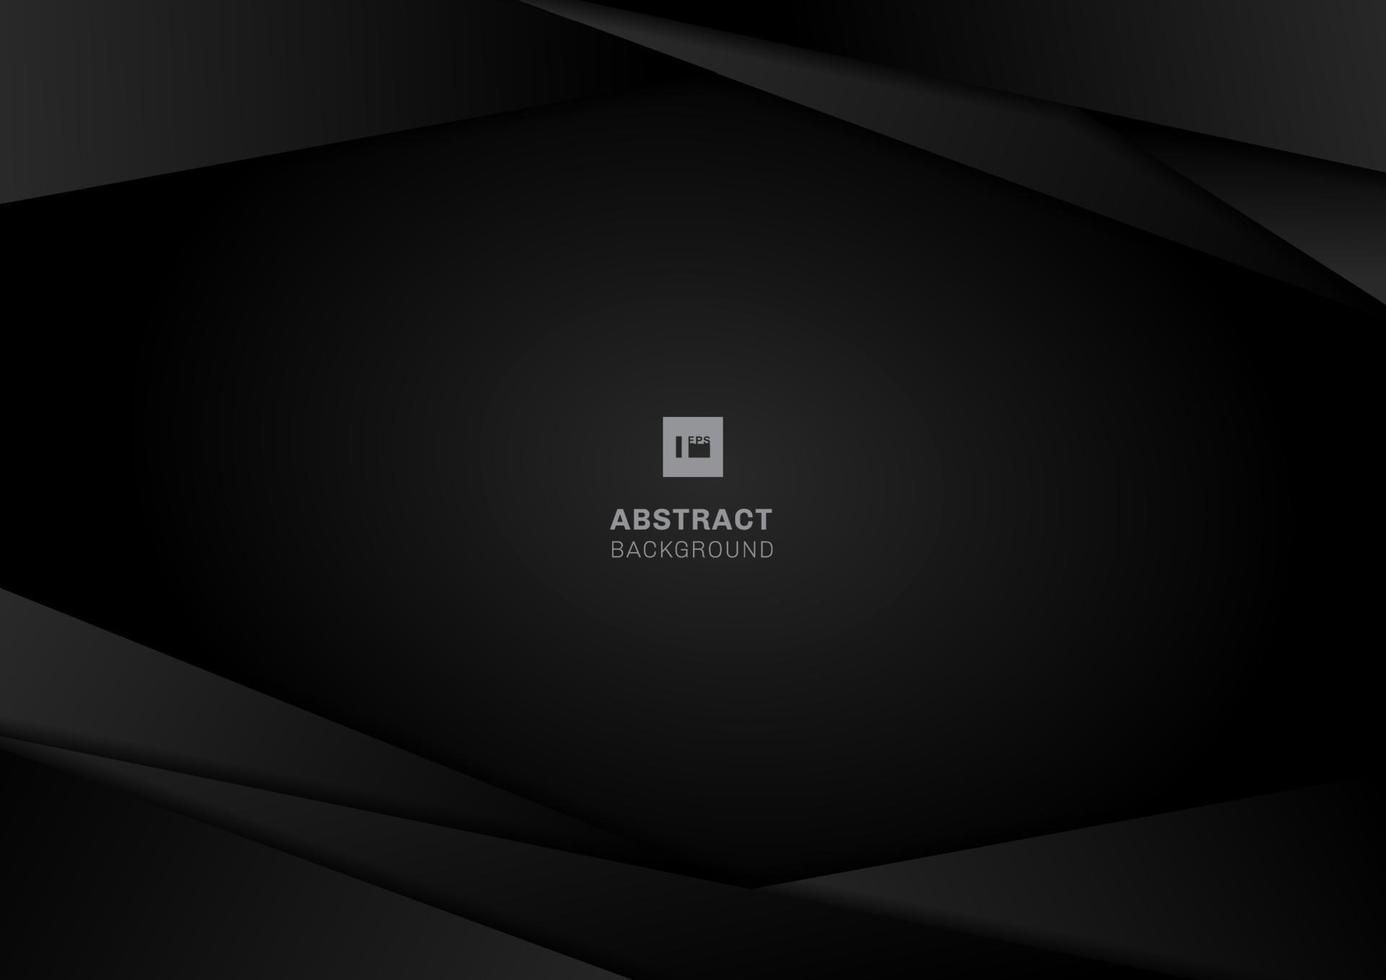 abstracte sjabloon zwarte geometrische frame-indeling. modern technologieontwerp op donkere achtergrond. vector